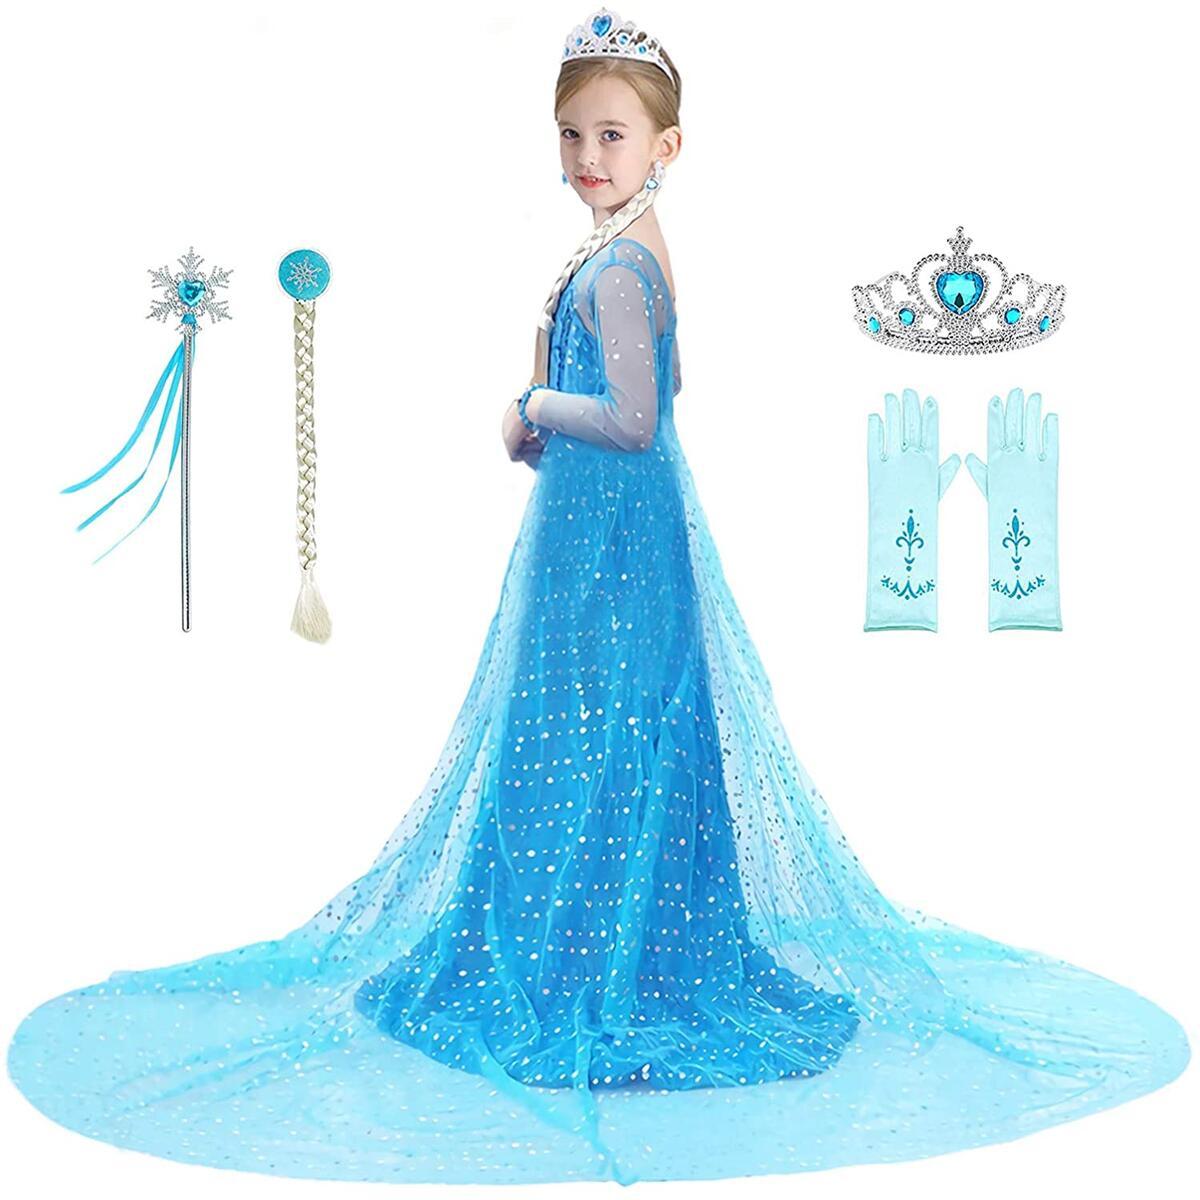 Bestier Girls Princess Dress Elsa Costume - Luxury Sequin Birthday Party Dress Up Girls 2-10 Years  (4-5 Years)